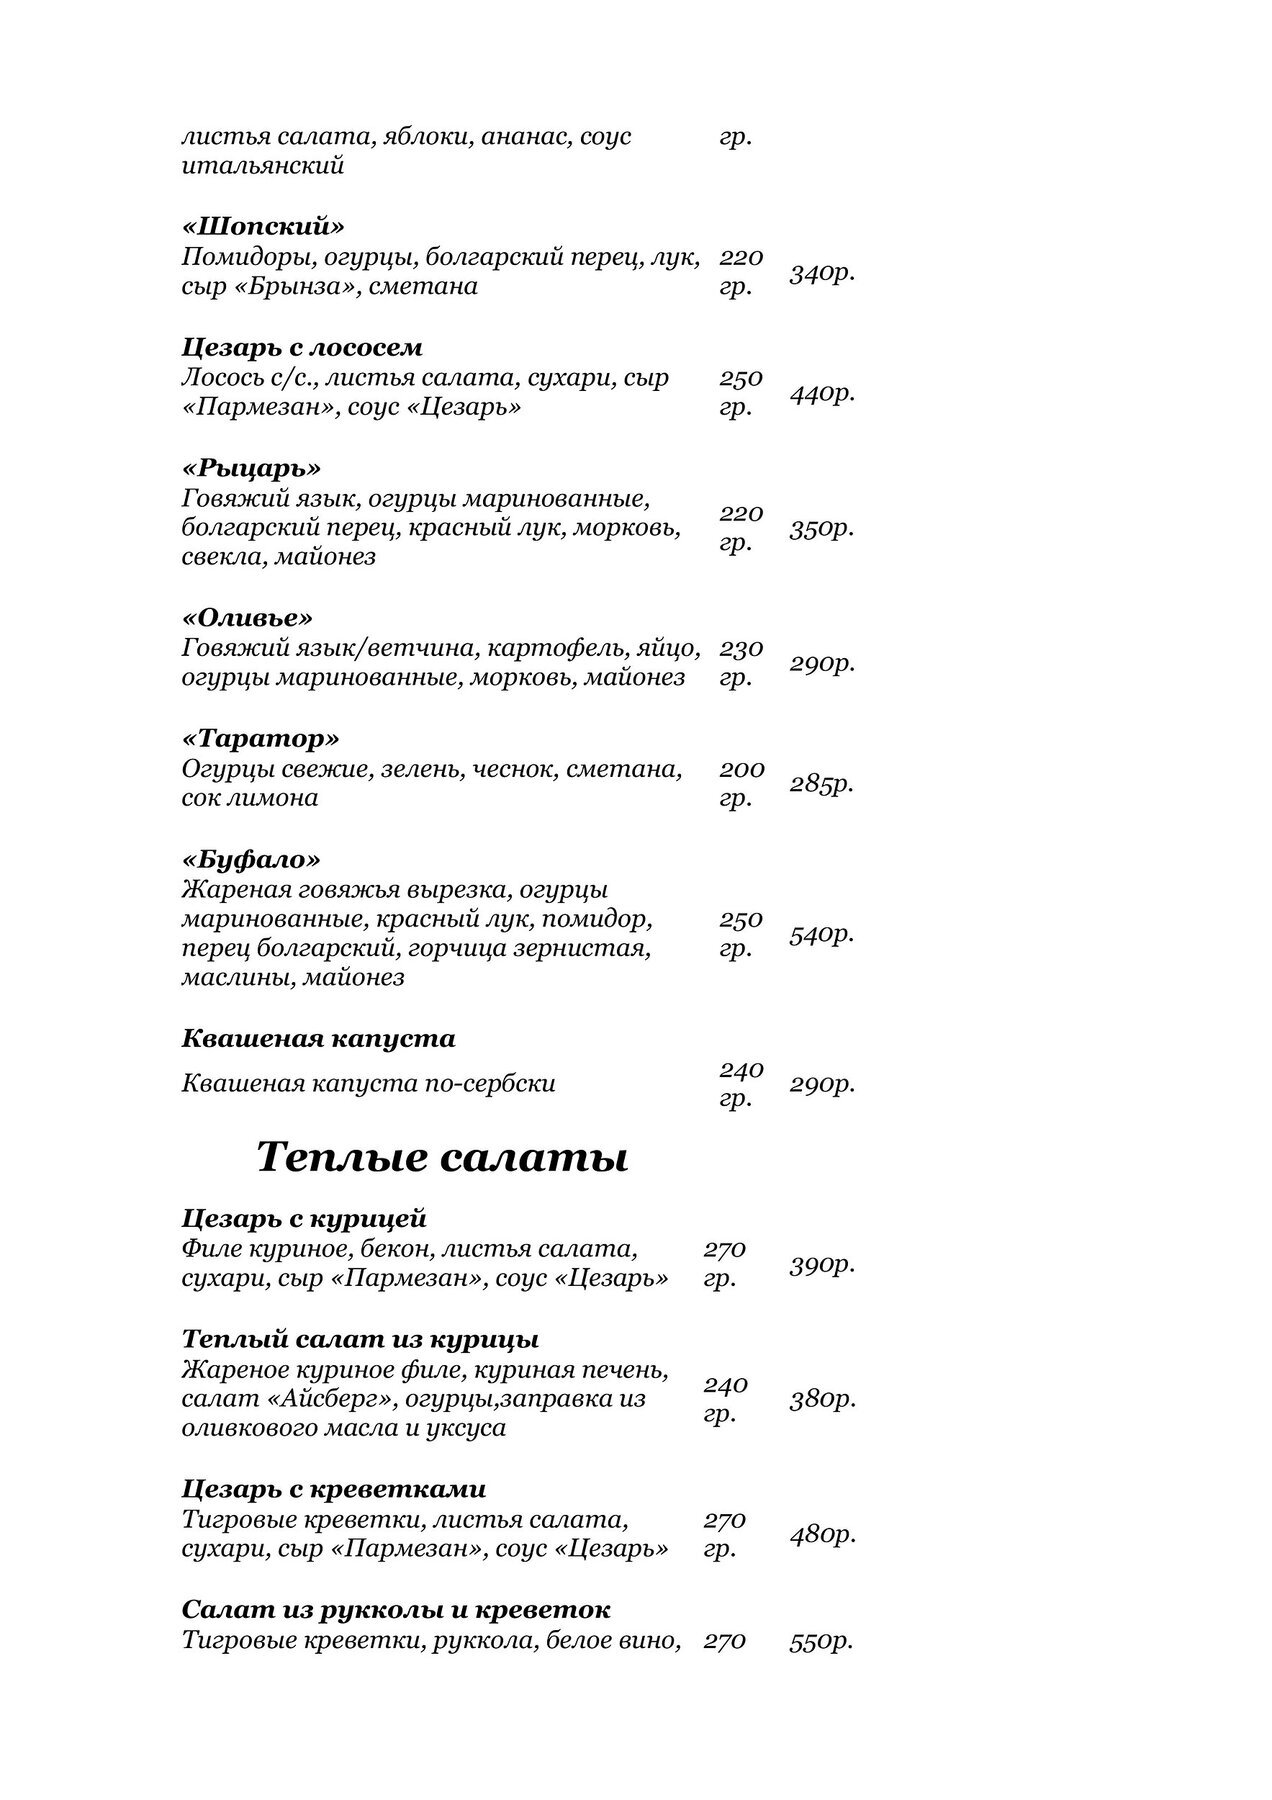 Меню ресторана Балканский Гурман на Декабристов фото 3